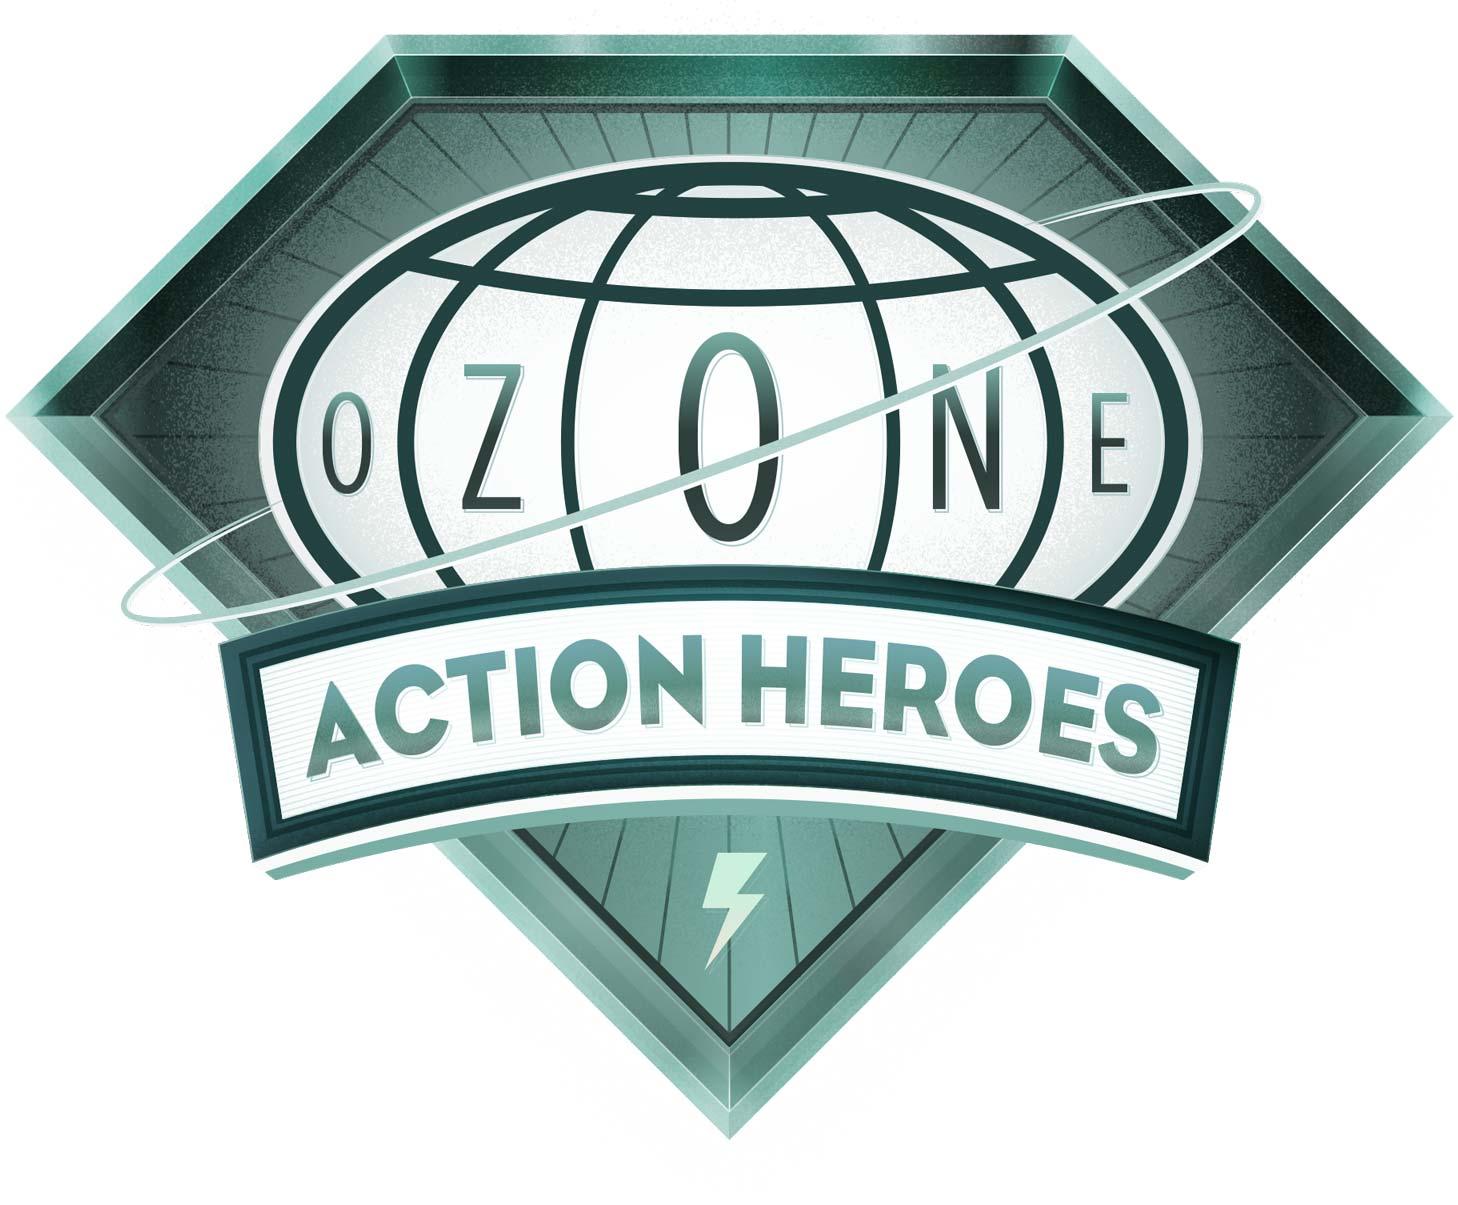 Ozone Action Heroes Logo